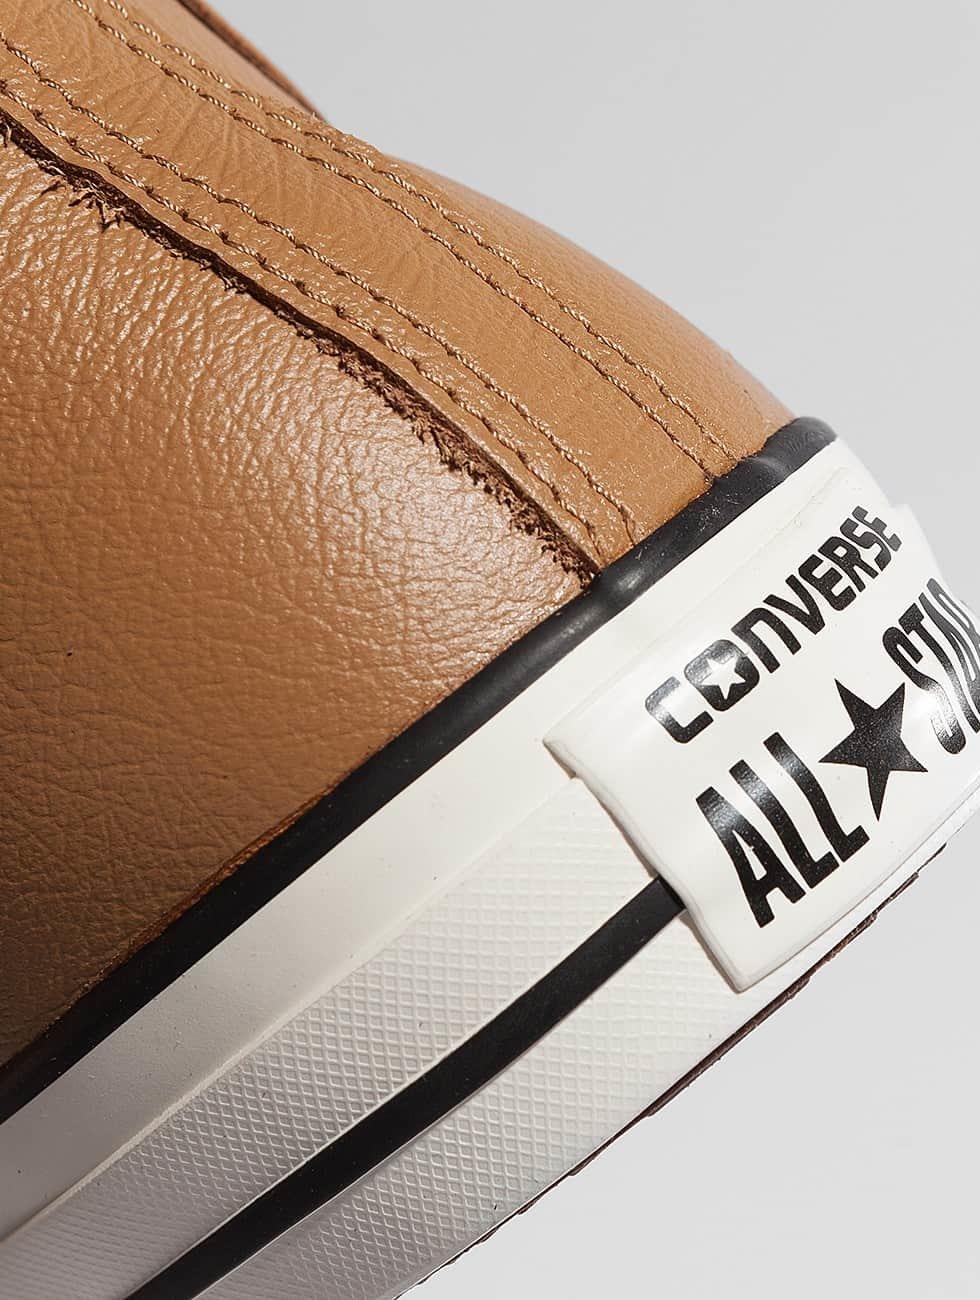 Inverse Schoen / Chuck Baskets Taylor All Star Dans Bruin 362461 Eastbay À Vendre Sortie 2018 Officiel Frais De Port Offerts Rdi1oN